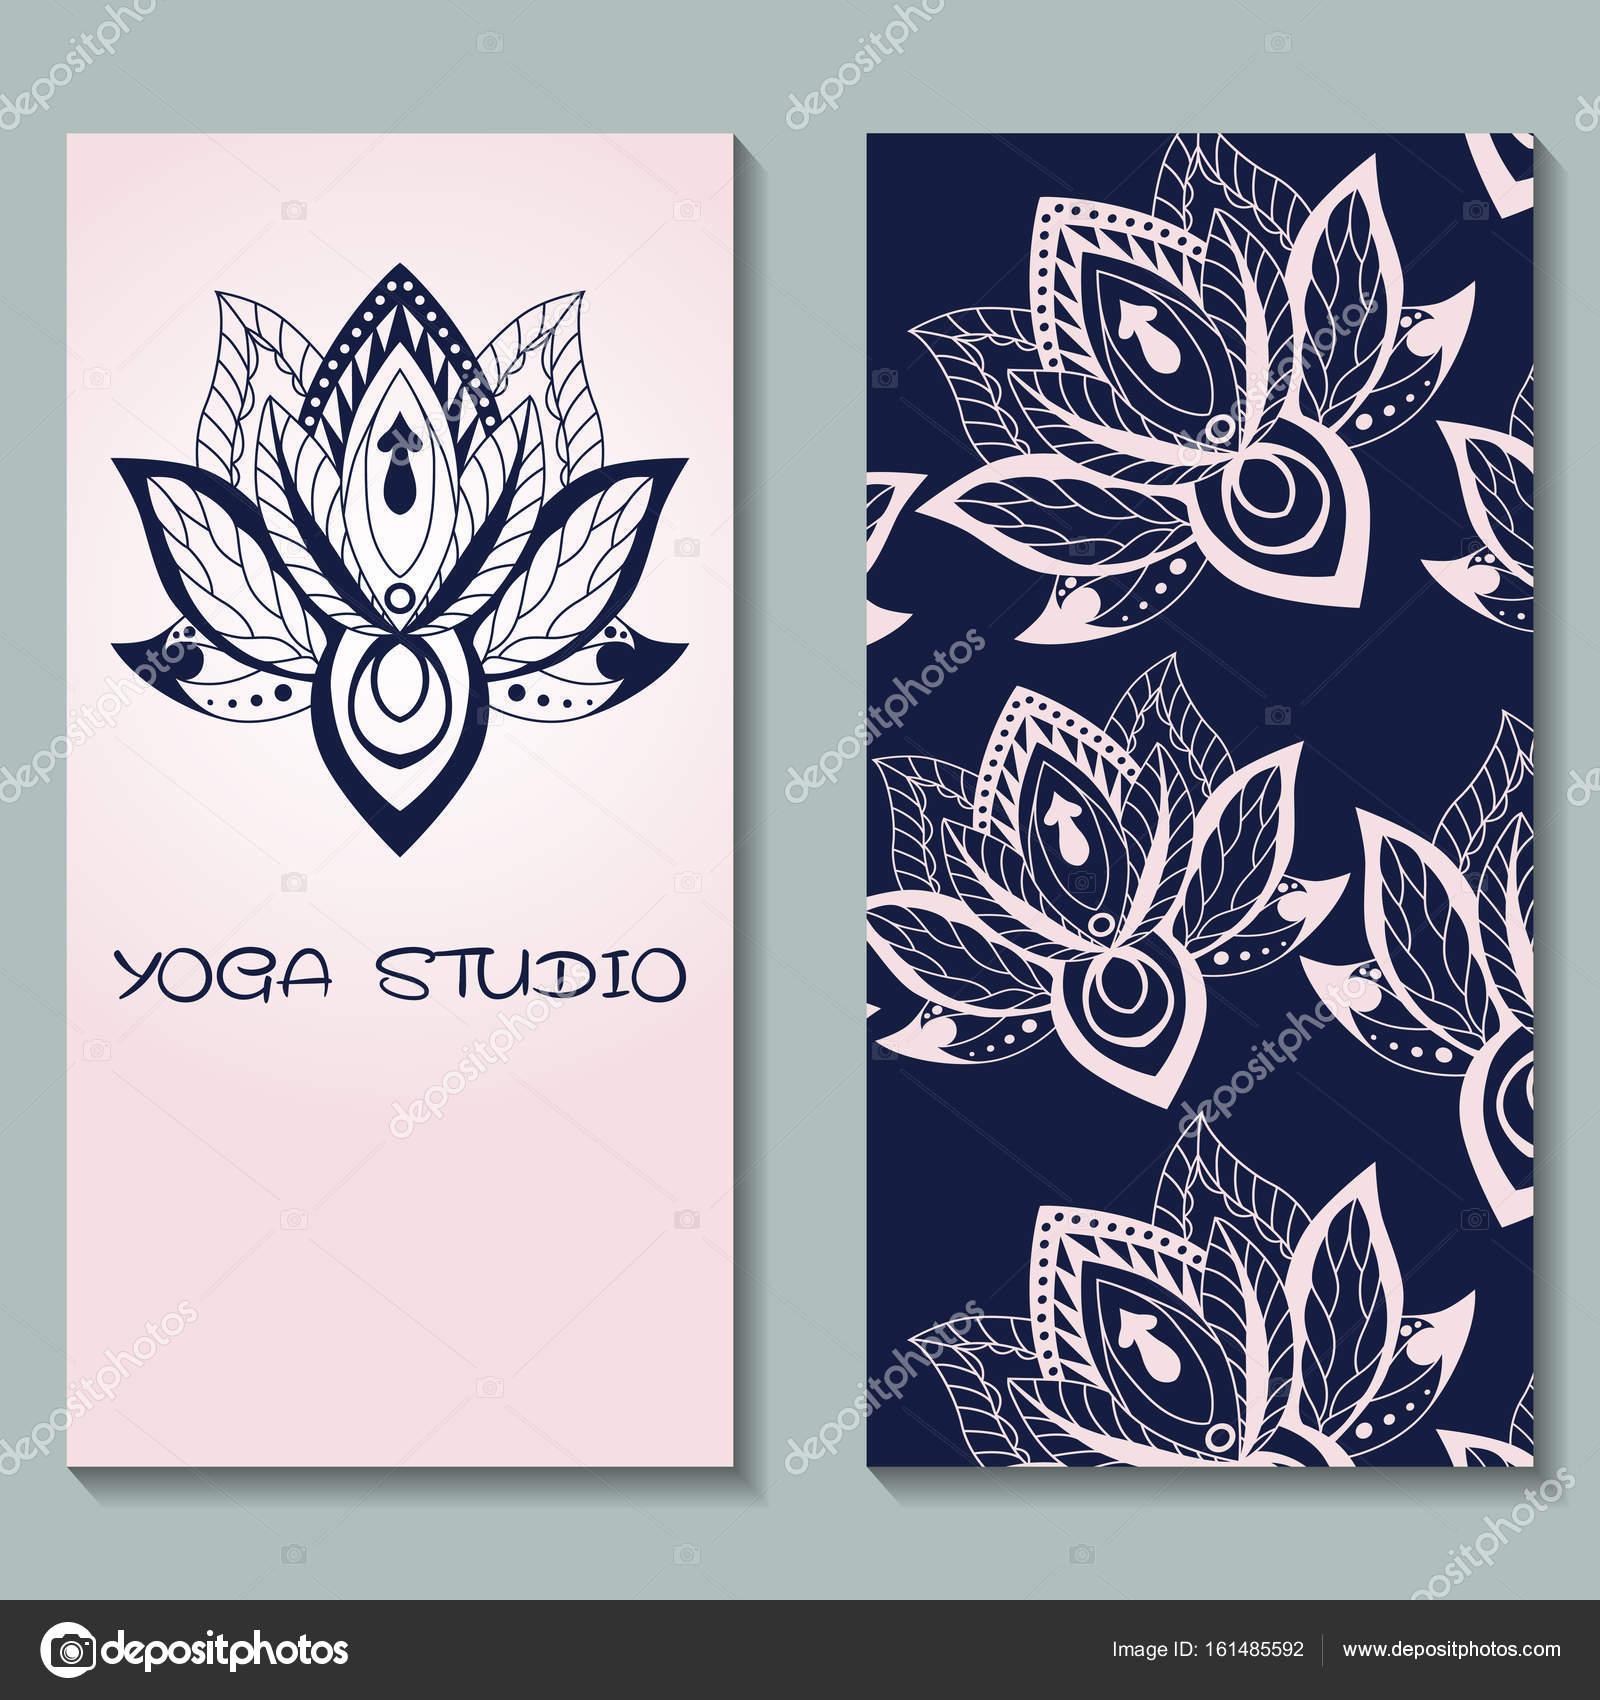 Karten Vorlage für Yoga-Studio mit Lotusblüten. Yoga vertikale vecto ...